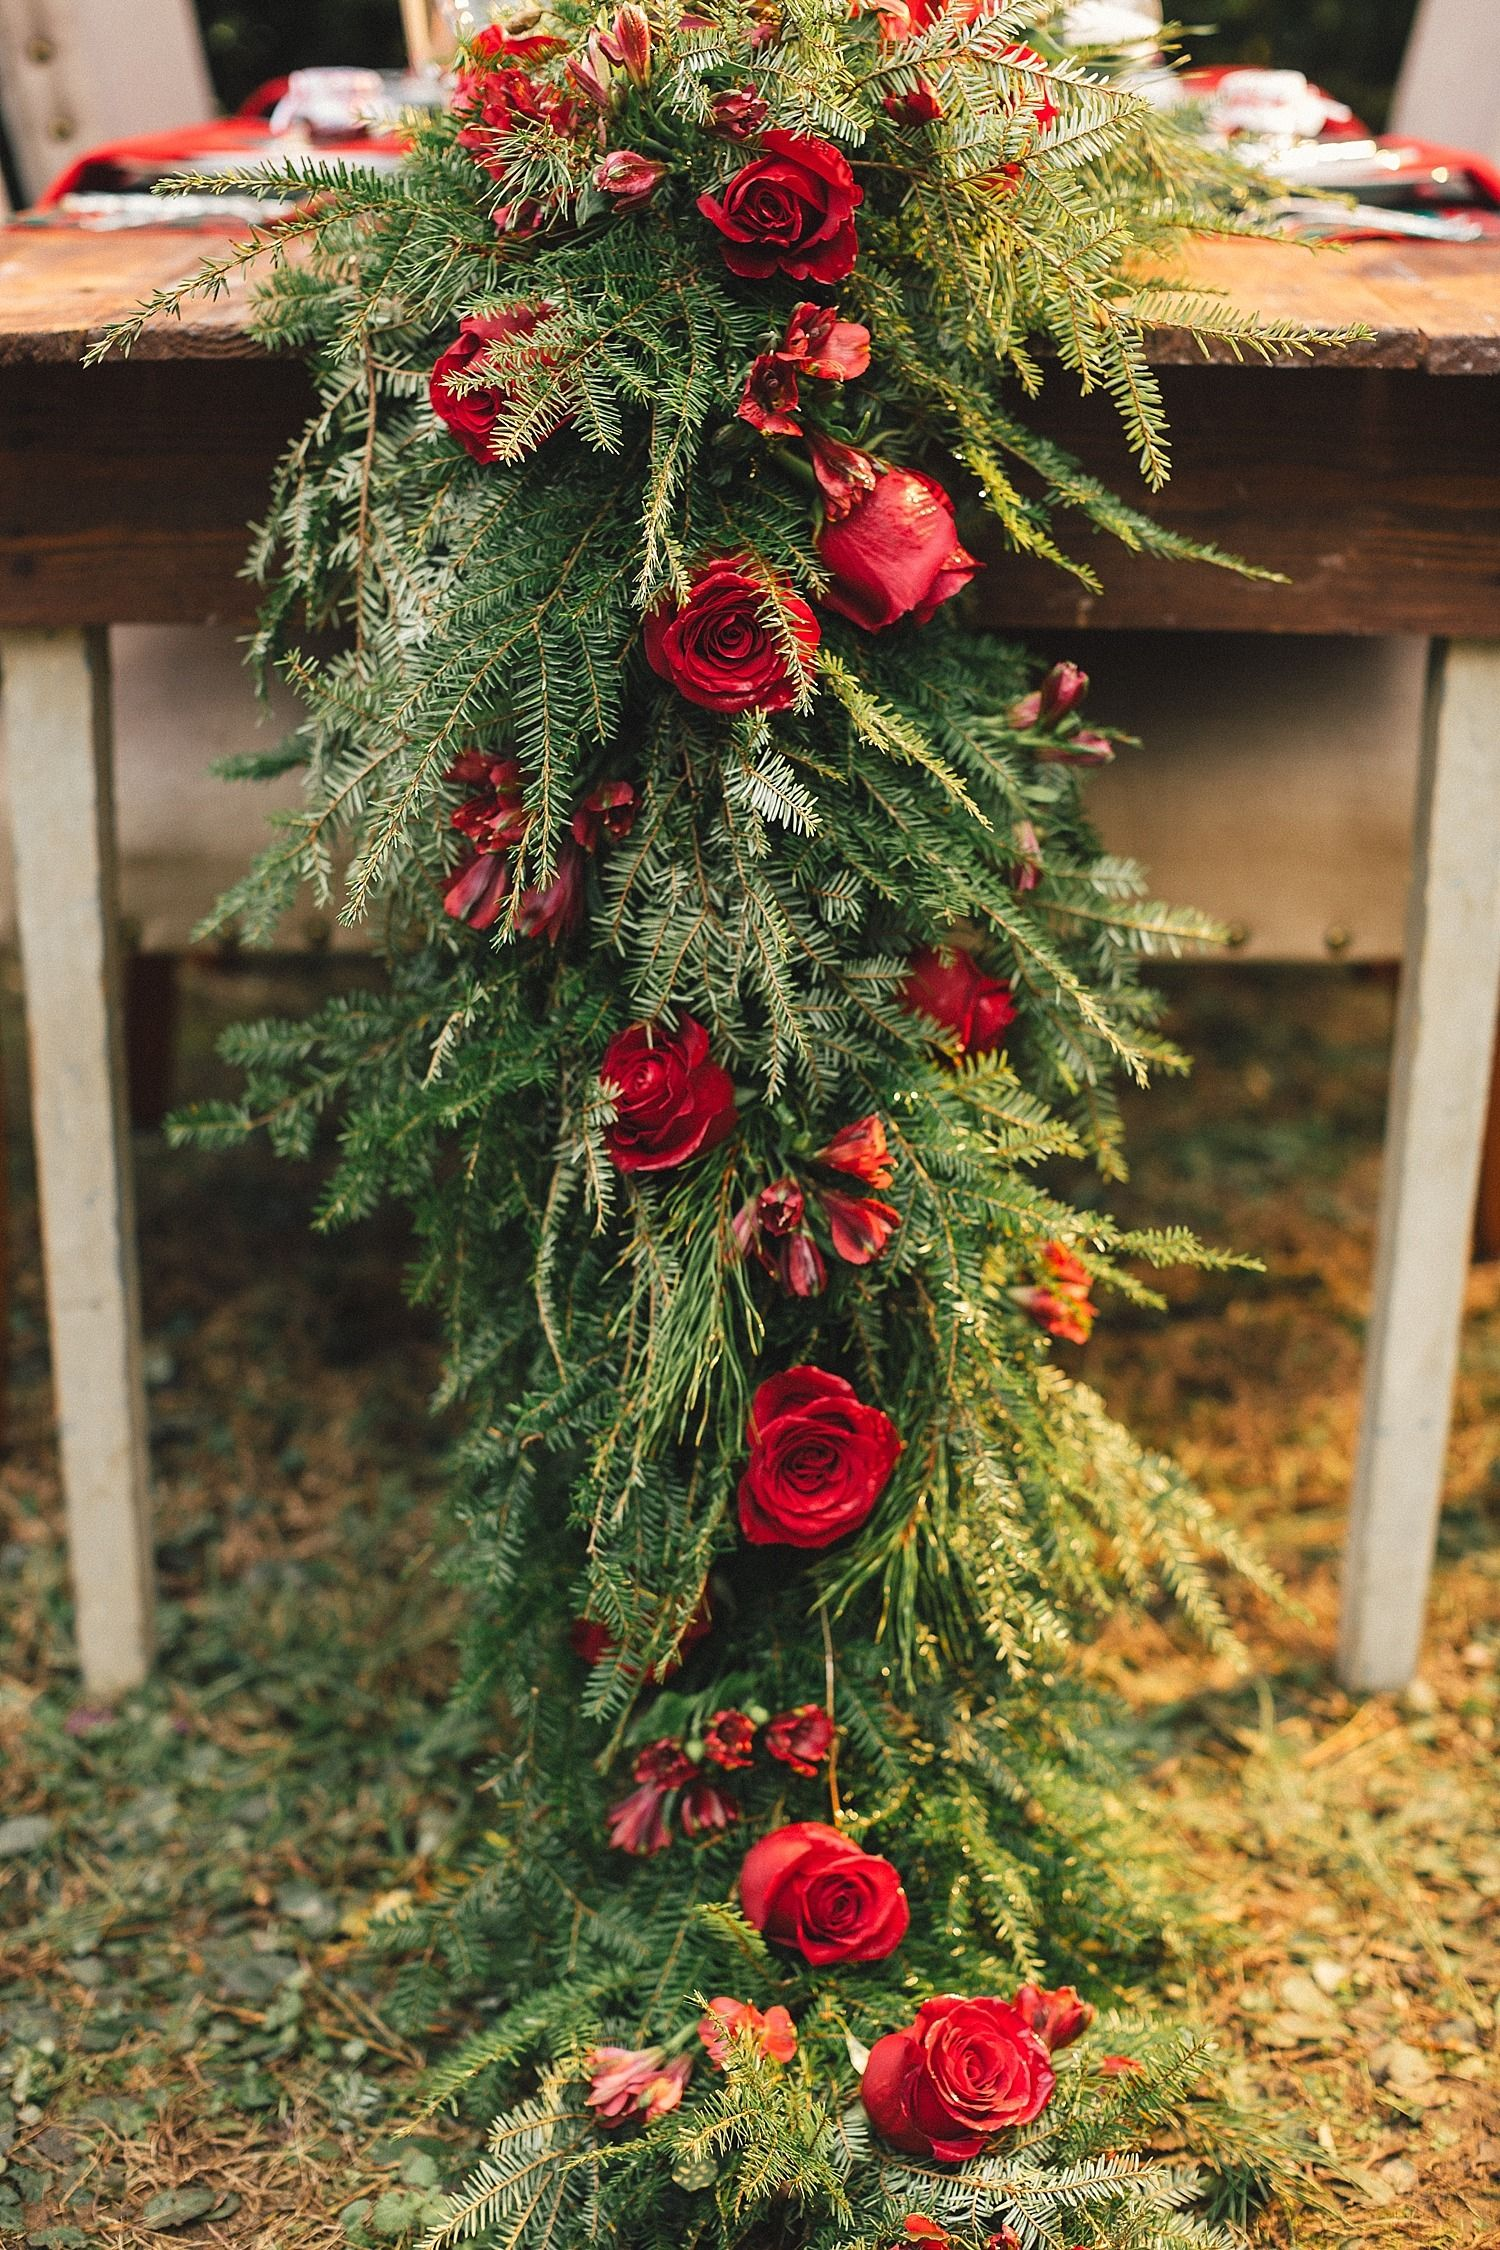 Bluebird Christmas Tree Farm Inspiration Shoot  Read more - http://www.stylemepretty.com/tennessee-weddings/knoxville/2013/12/20/bluebird-christmas-tree-farm-inspiration-shoot/